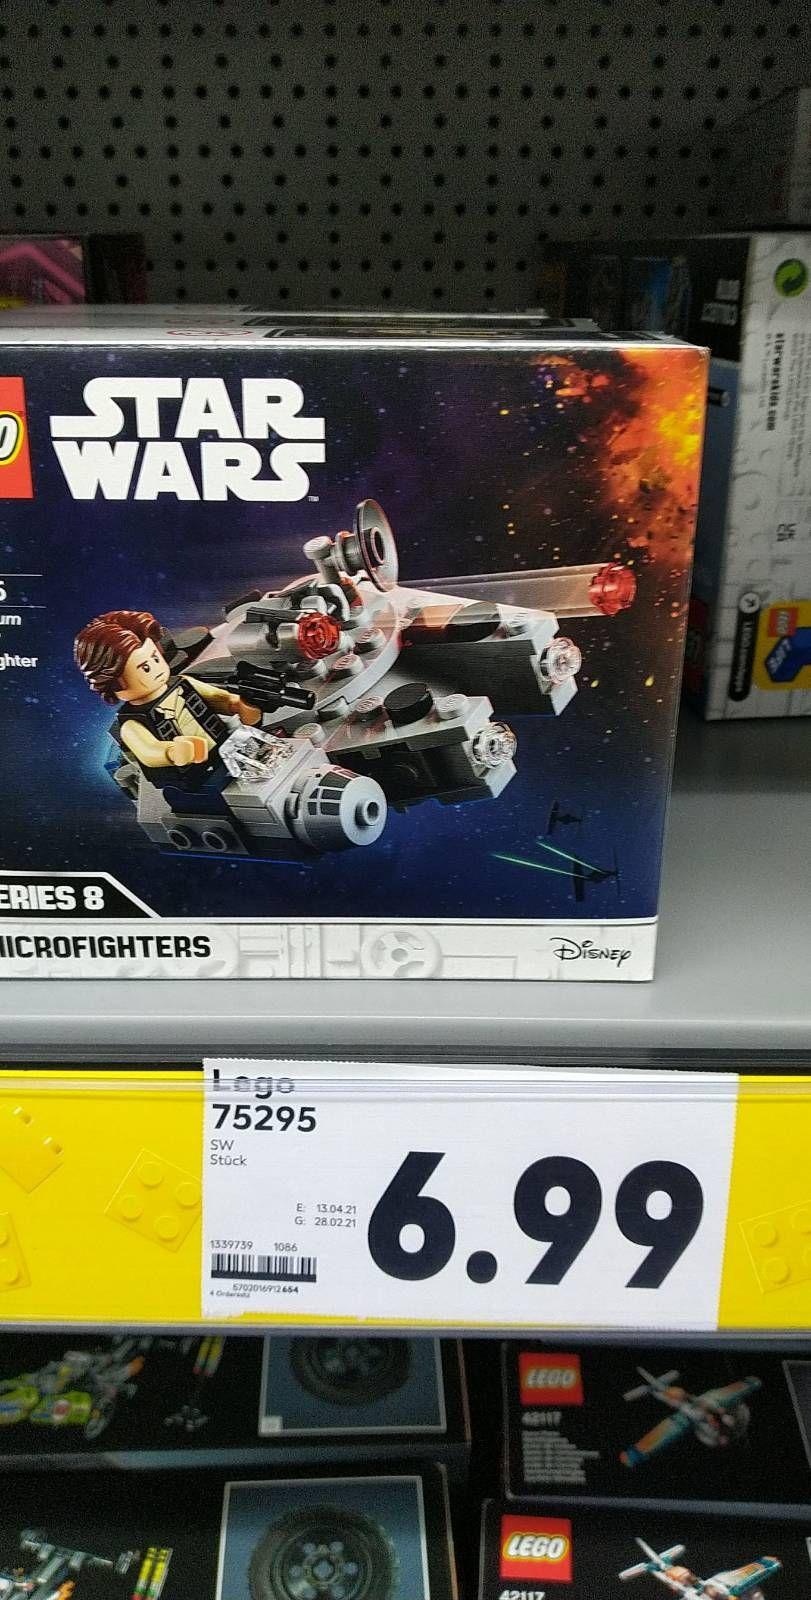 [Lokal] Kaufland Weimar bundesweit? Lego 75295 Millennium Falke Microfighter